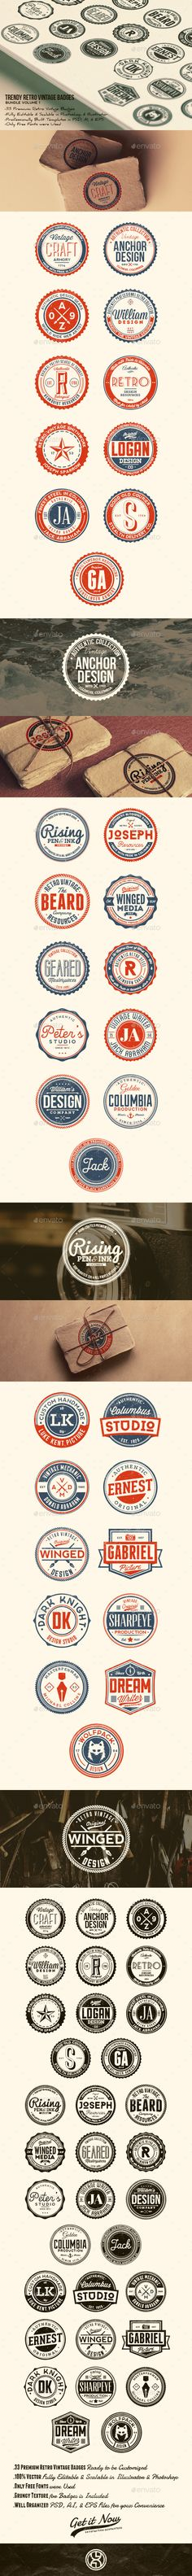 33 Trendy Retro Vintage Badges Bundle Volume 1 - Badges & Stickers Web Elements